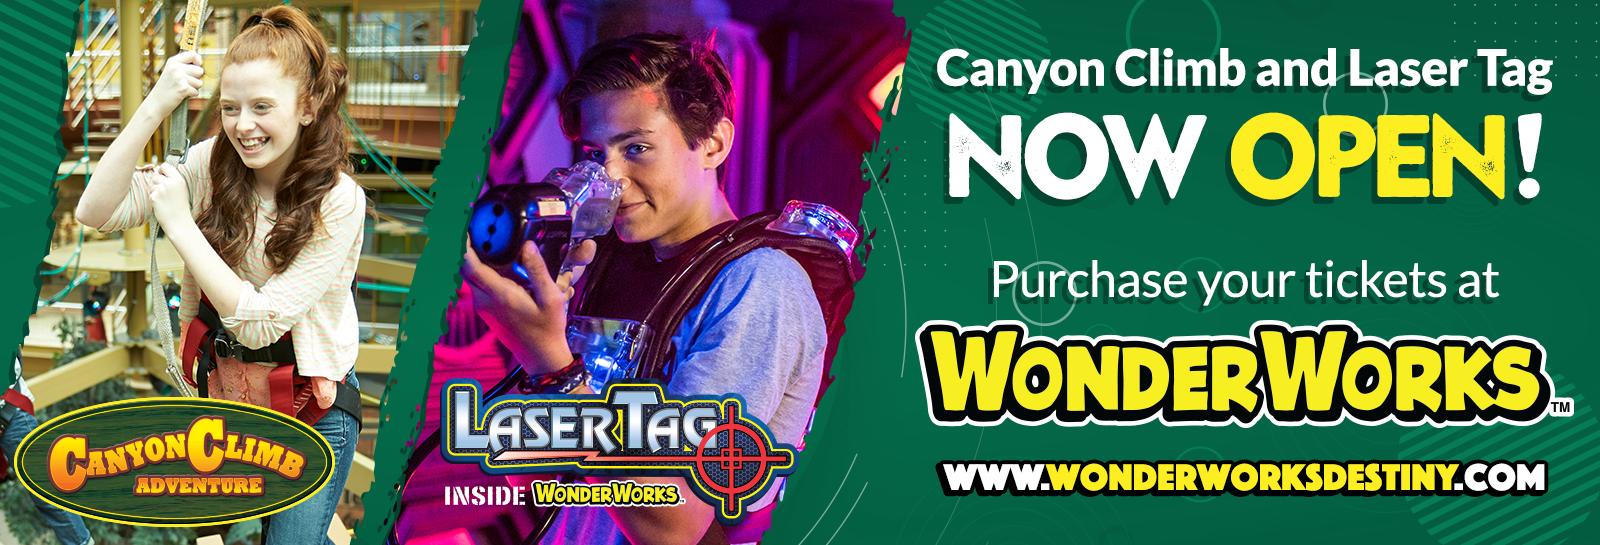 WonderWorks Website Banner 1600 x 545 copy